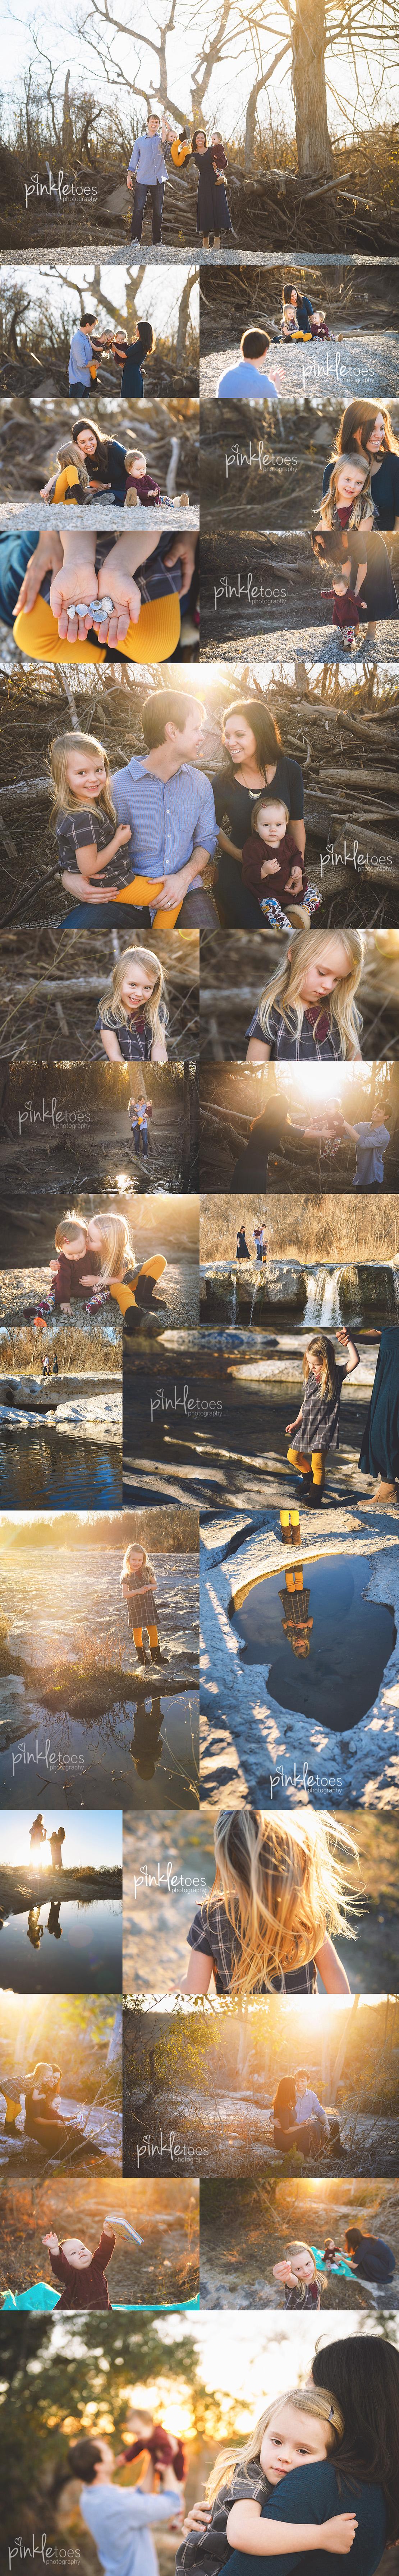 golden-sunshine-mckinney-falls-baby-child-family-lifestyle-austin-texas-photographer